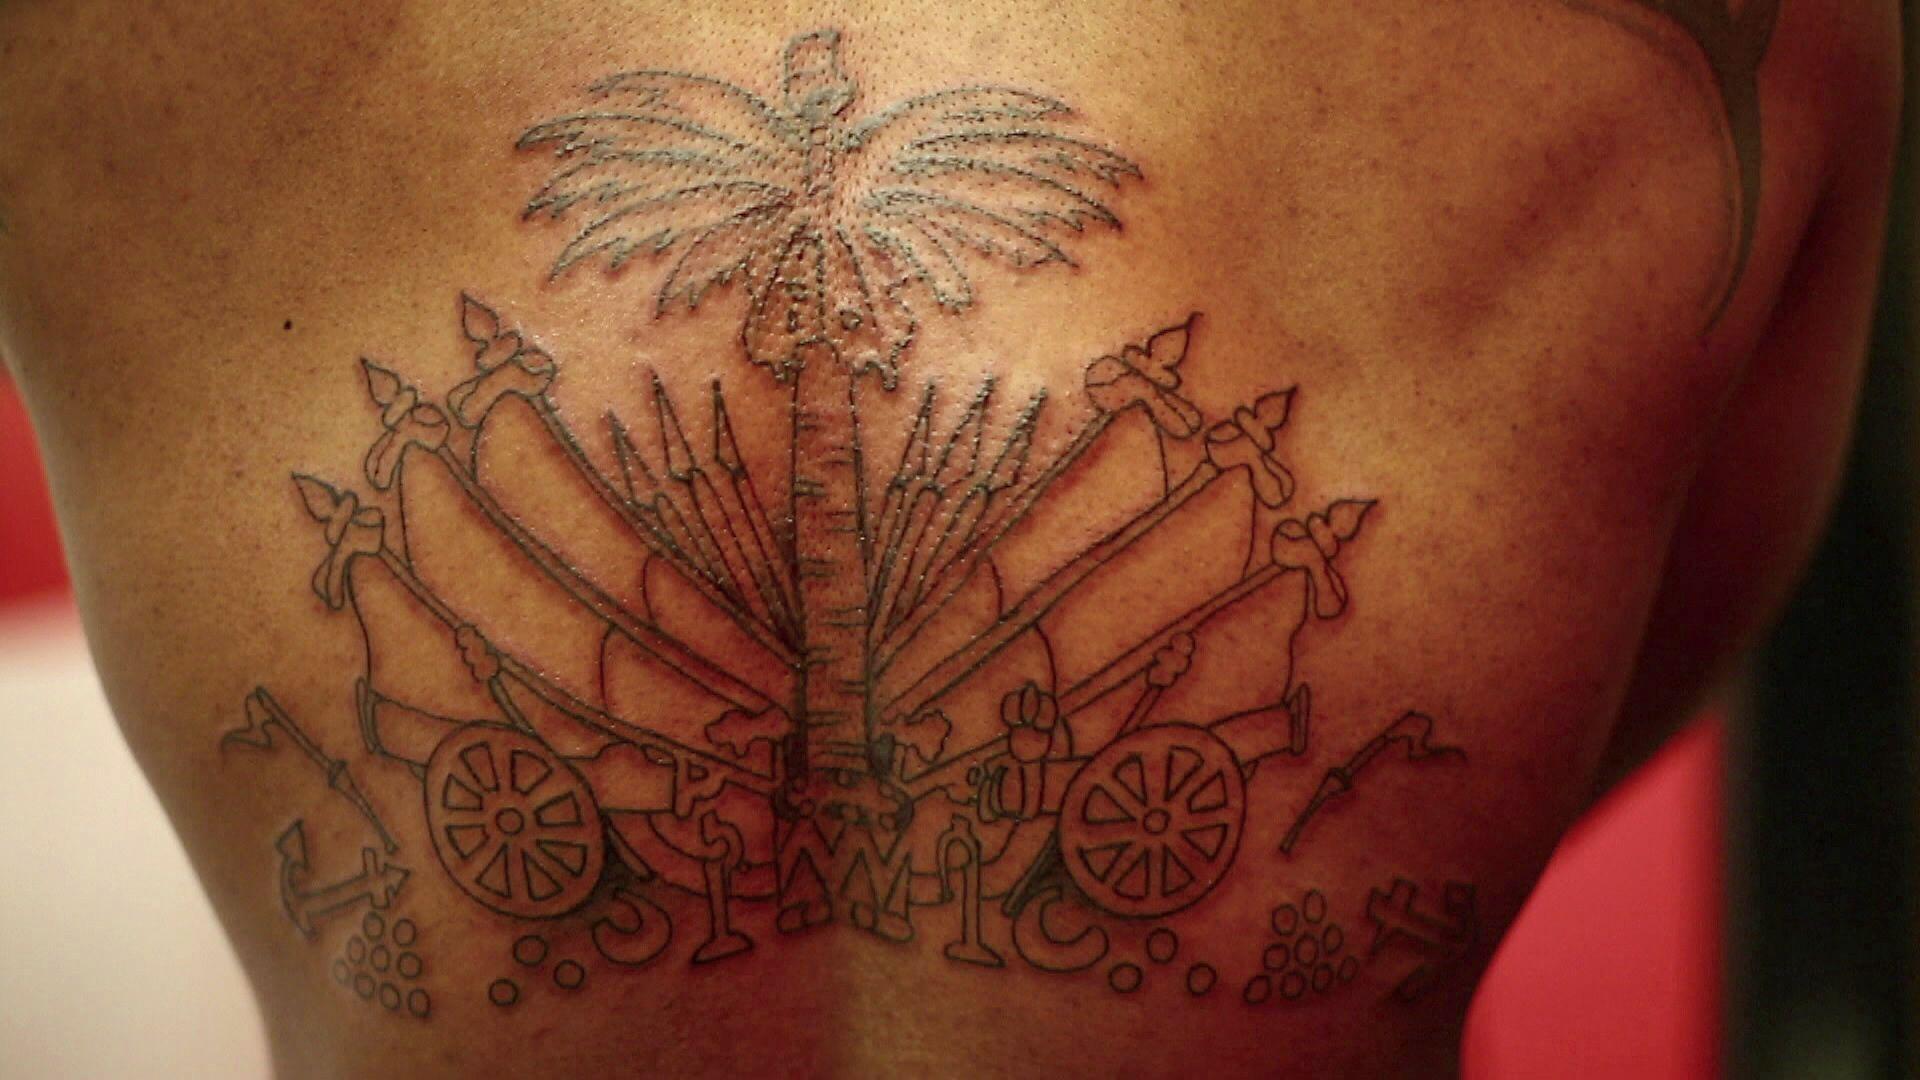 17 7 tattoo designs tribal phoenix tattoo designs phoenix tattoo capoeira tattoo design. Black Bedroom Furniture Sets. Home Design Ideas